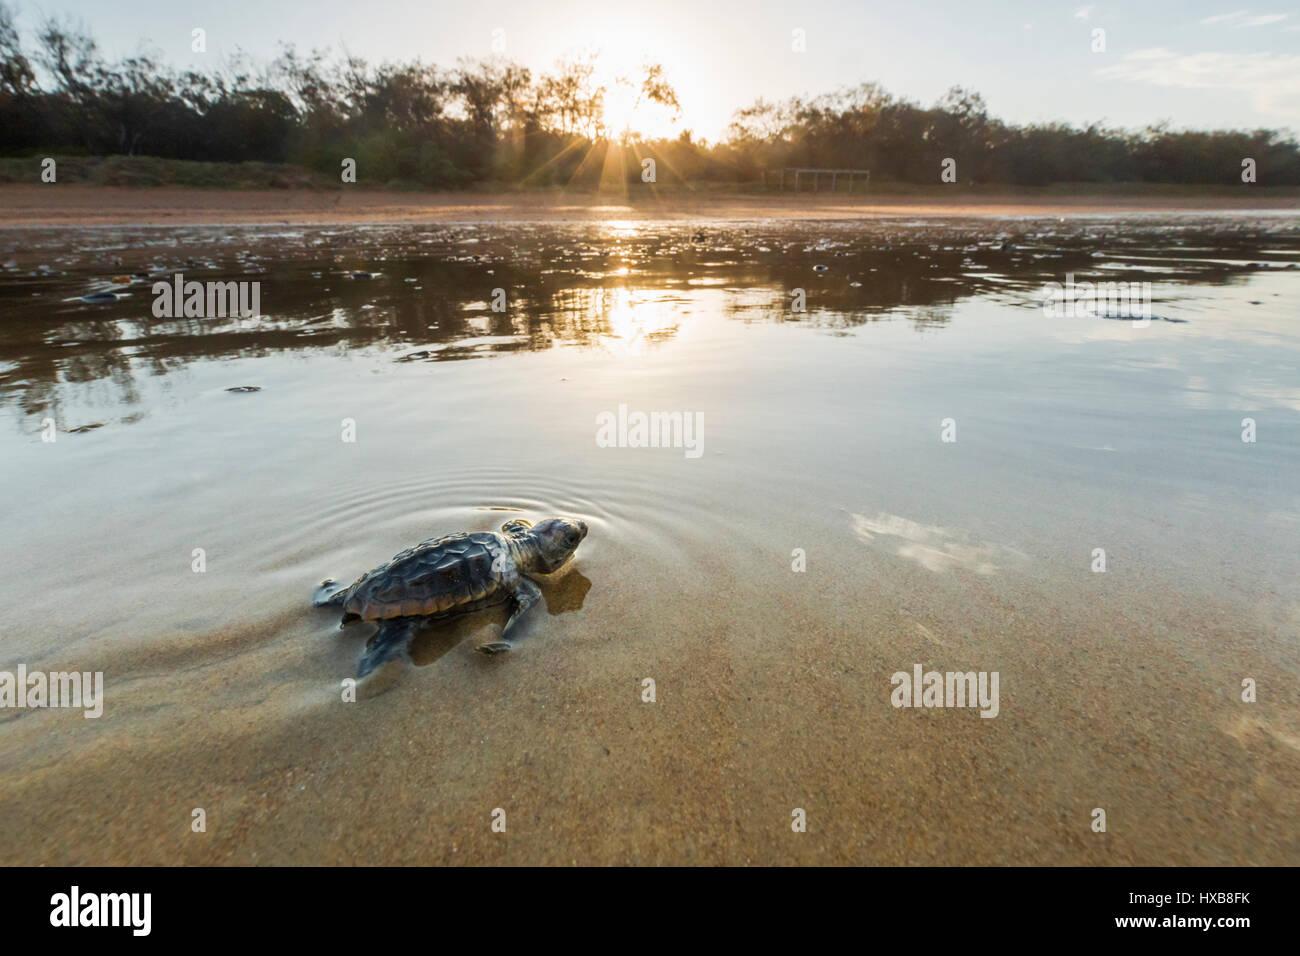 Bebé caguama (Caretta caretta) hace su viaje al mar al atardecer. Mon Repos Conservation Park, Bundaberg, Queensland, Imagen De Stock